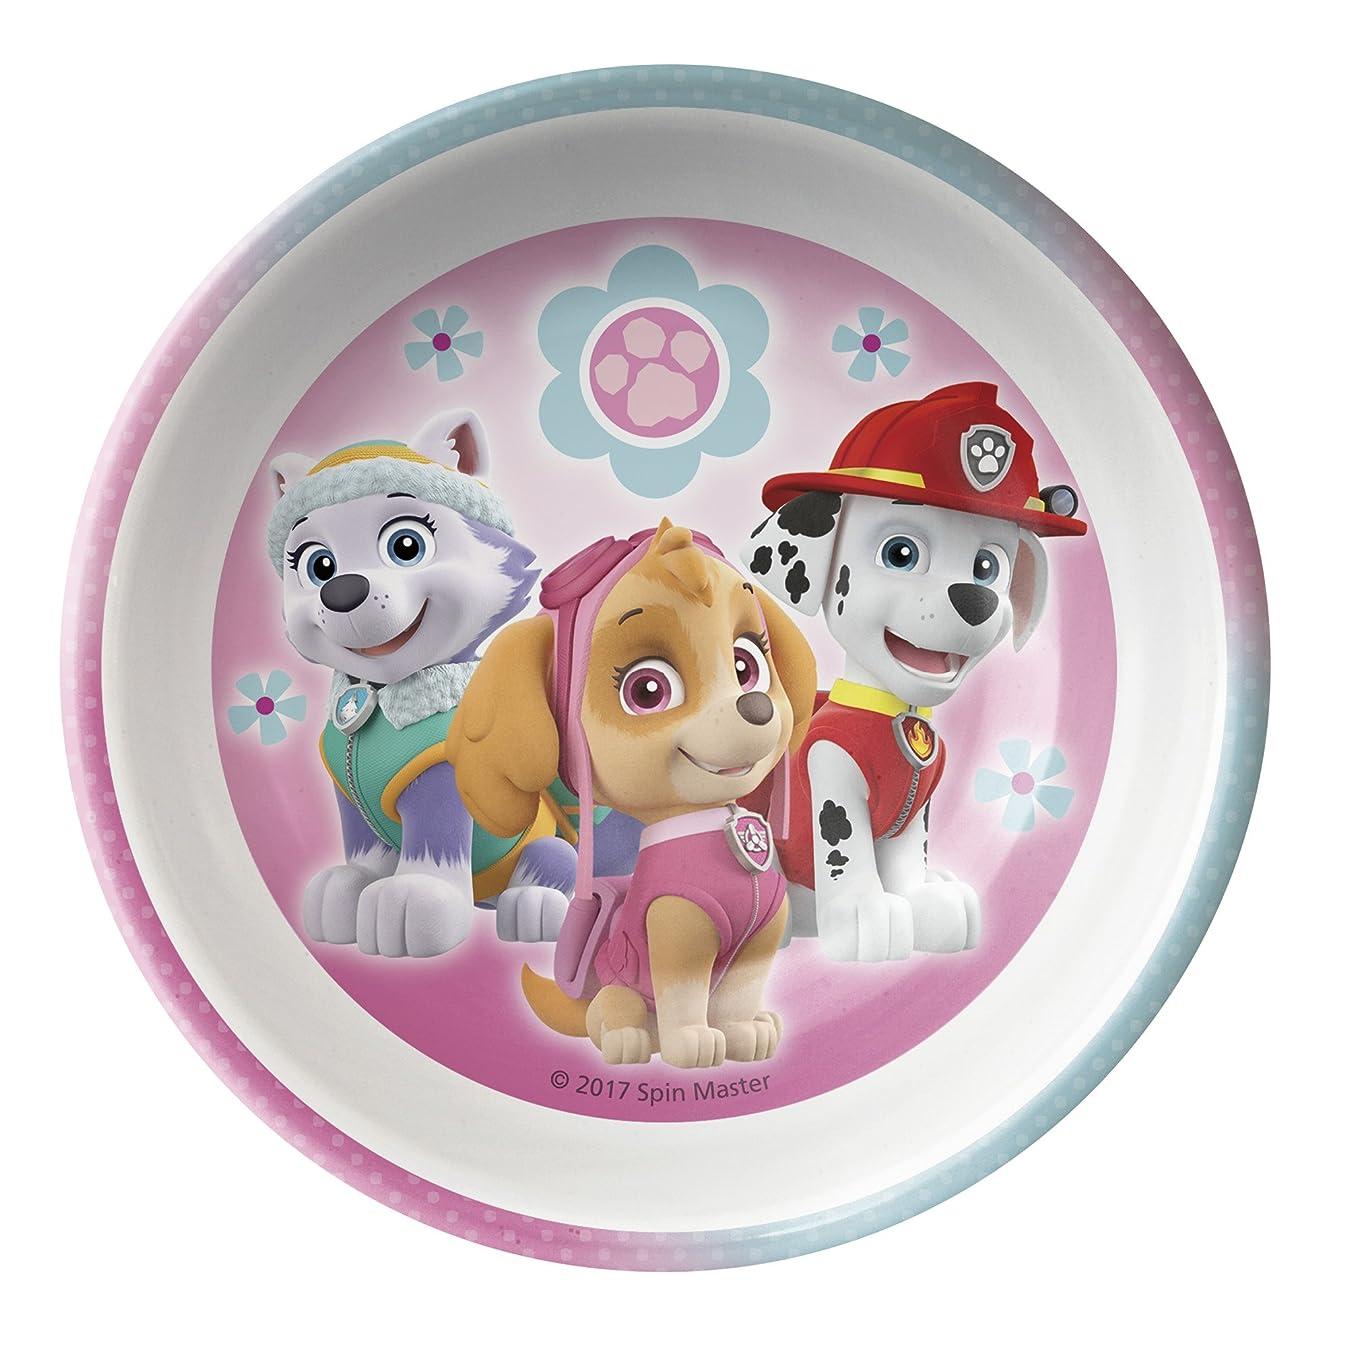 Nickelodeon PWPI-0363 Paw Patrol Girl Mel Bowl W-Rim, 15 oz, Multicolor